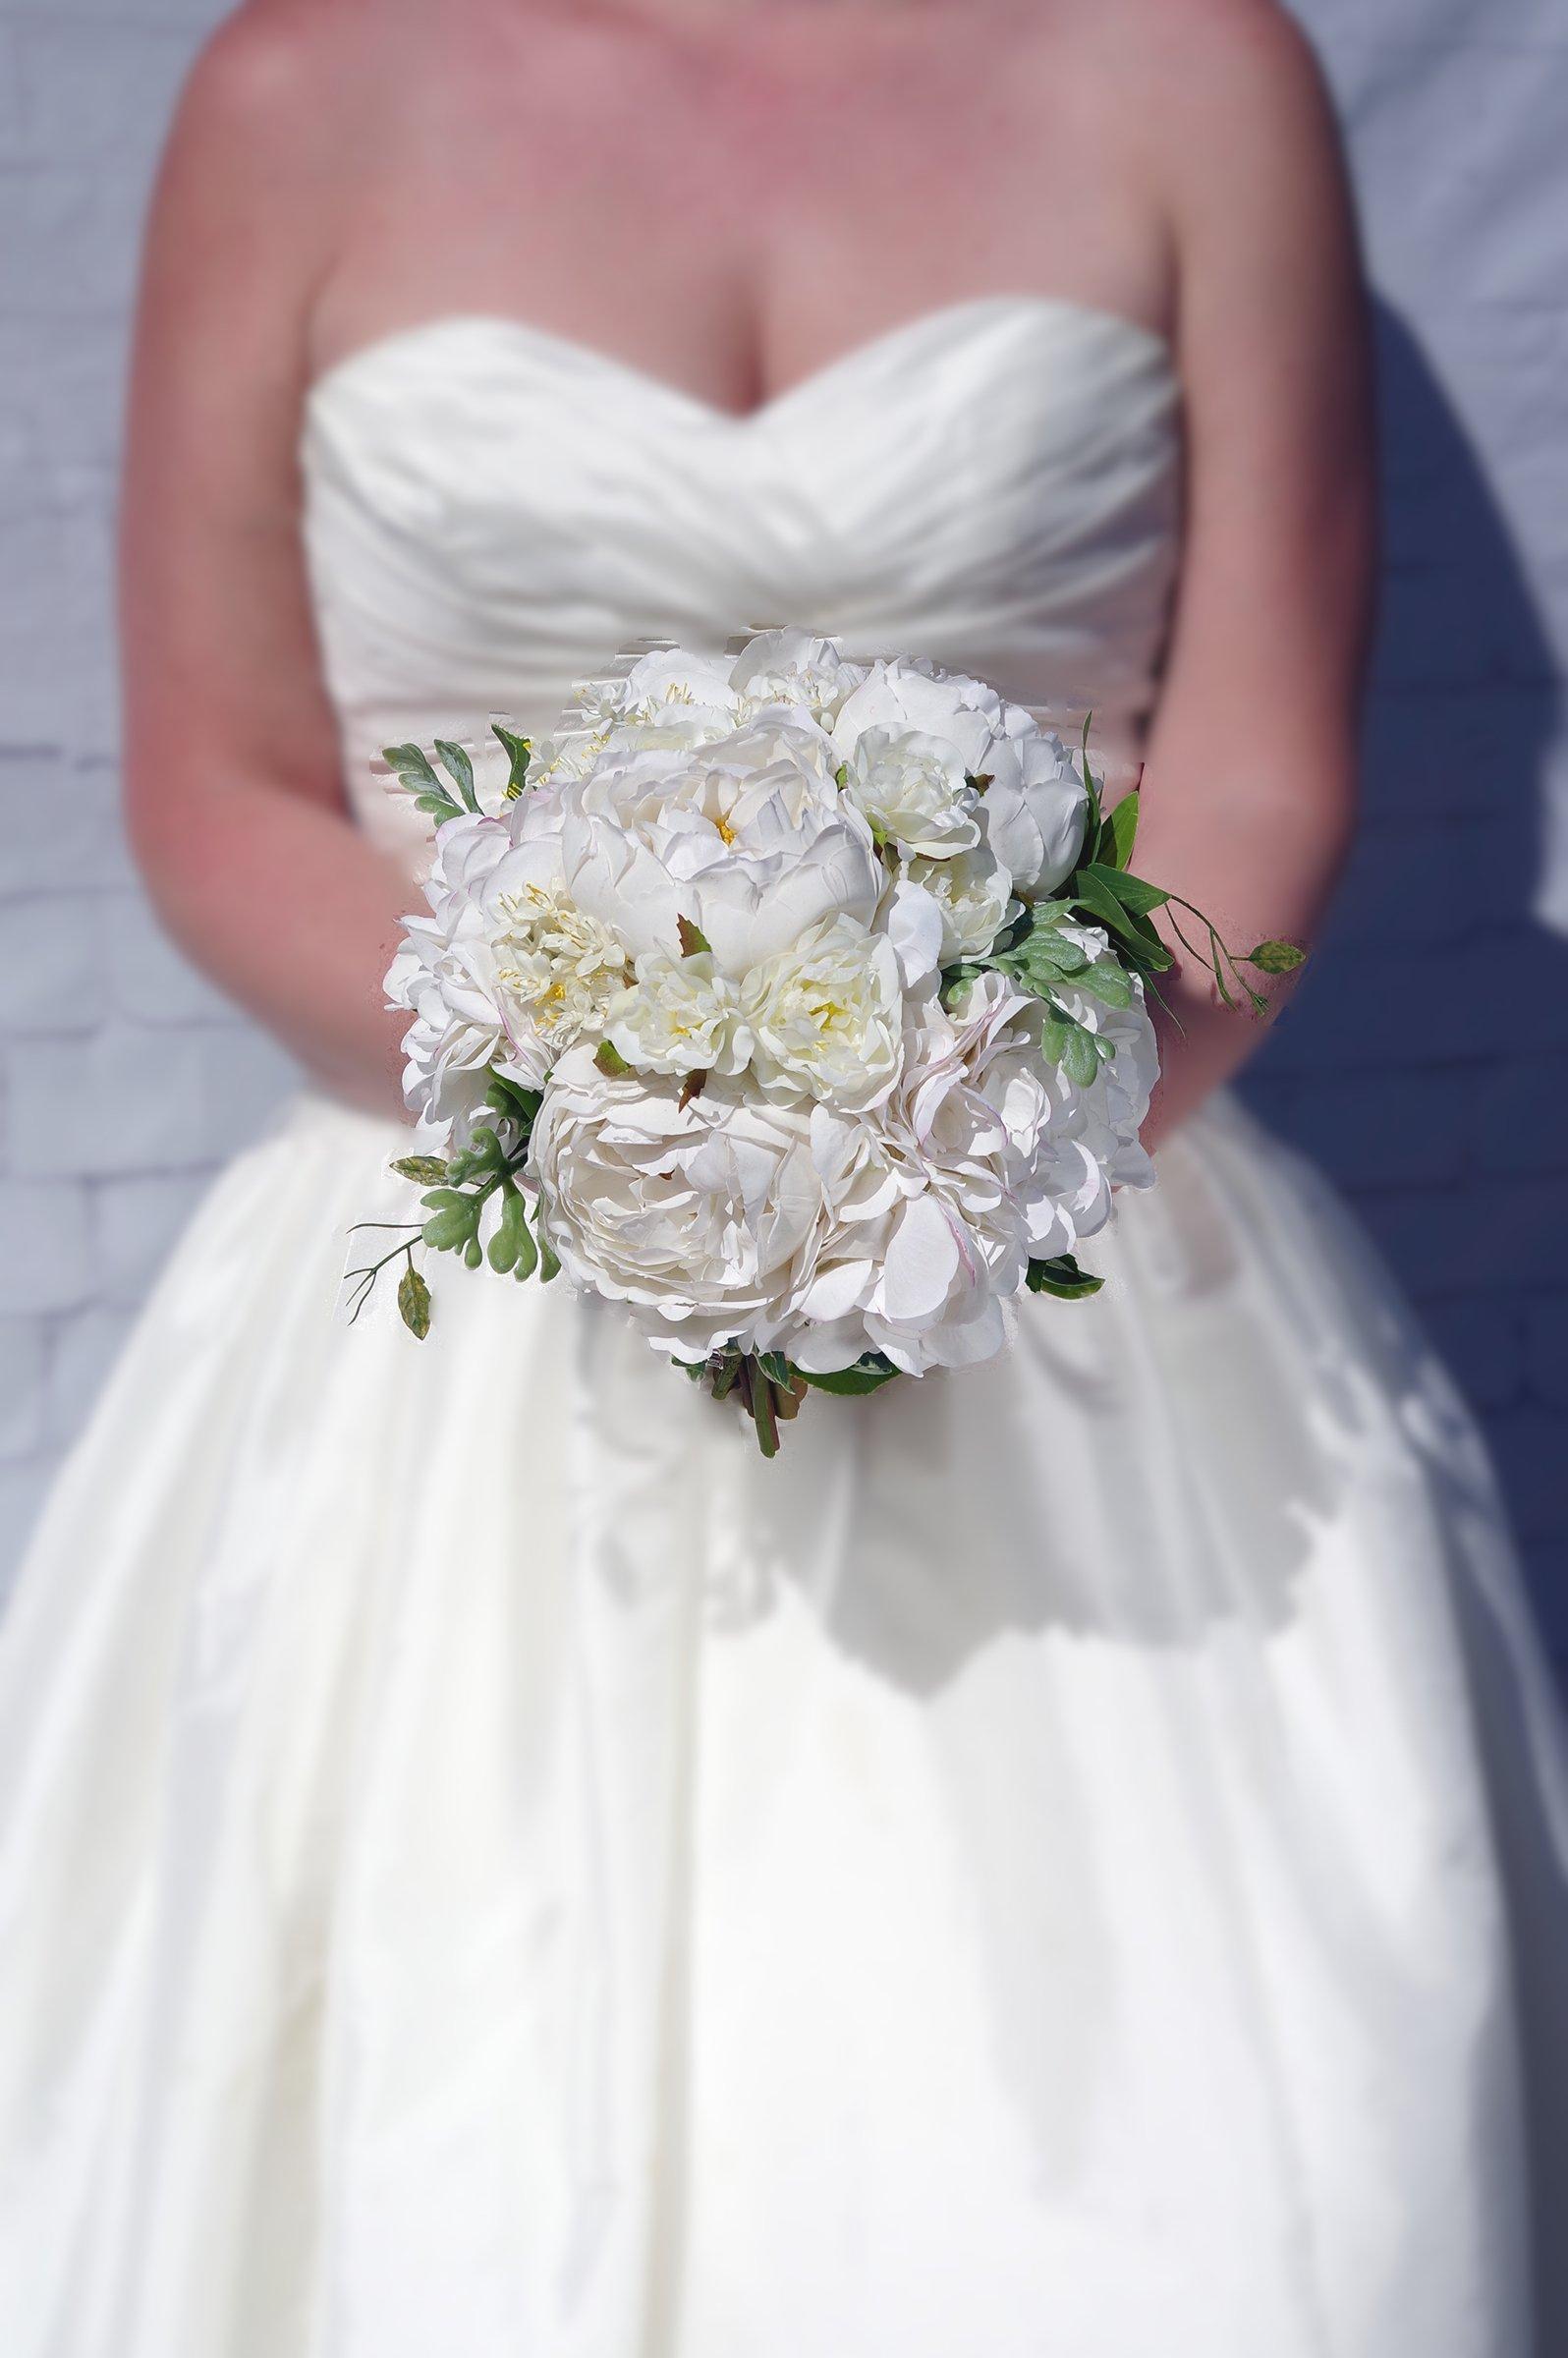 Bride Holding A Flower Bouquet